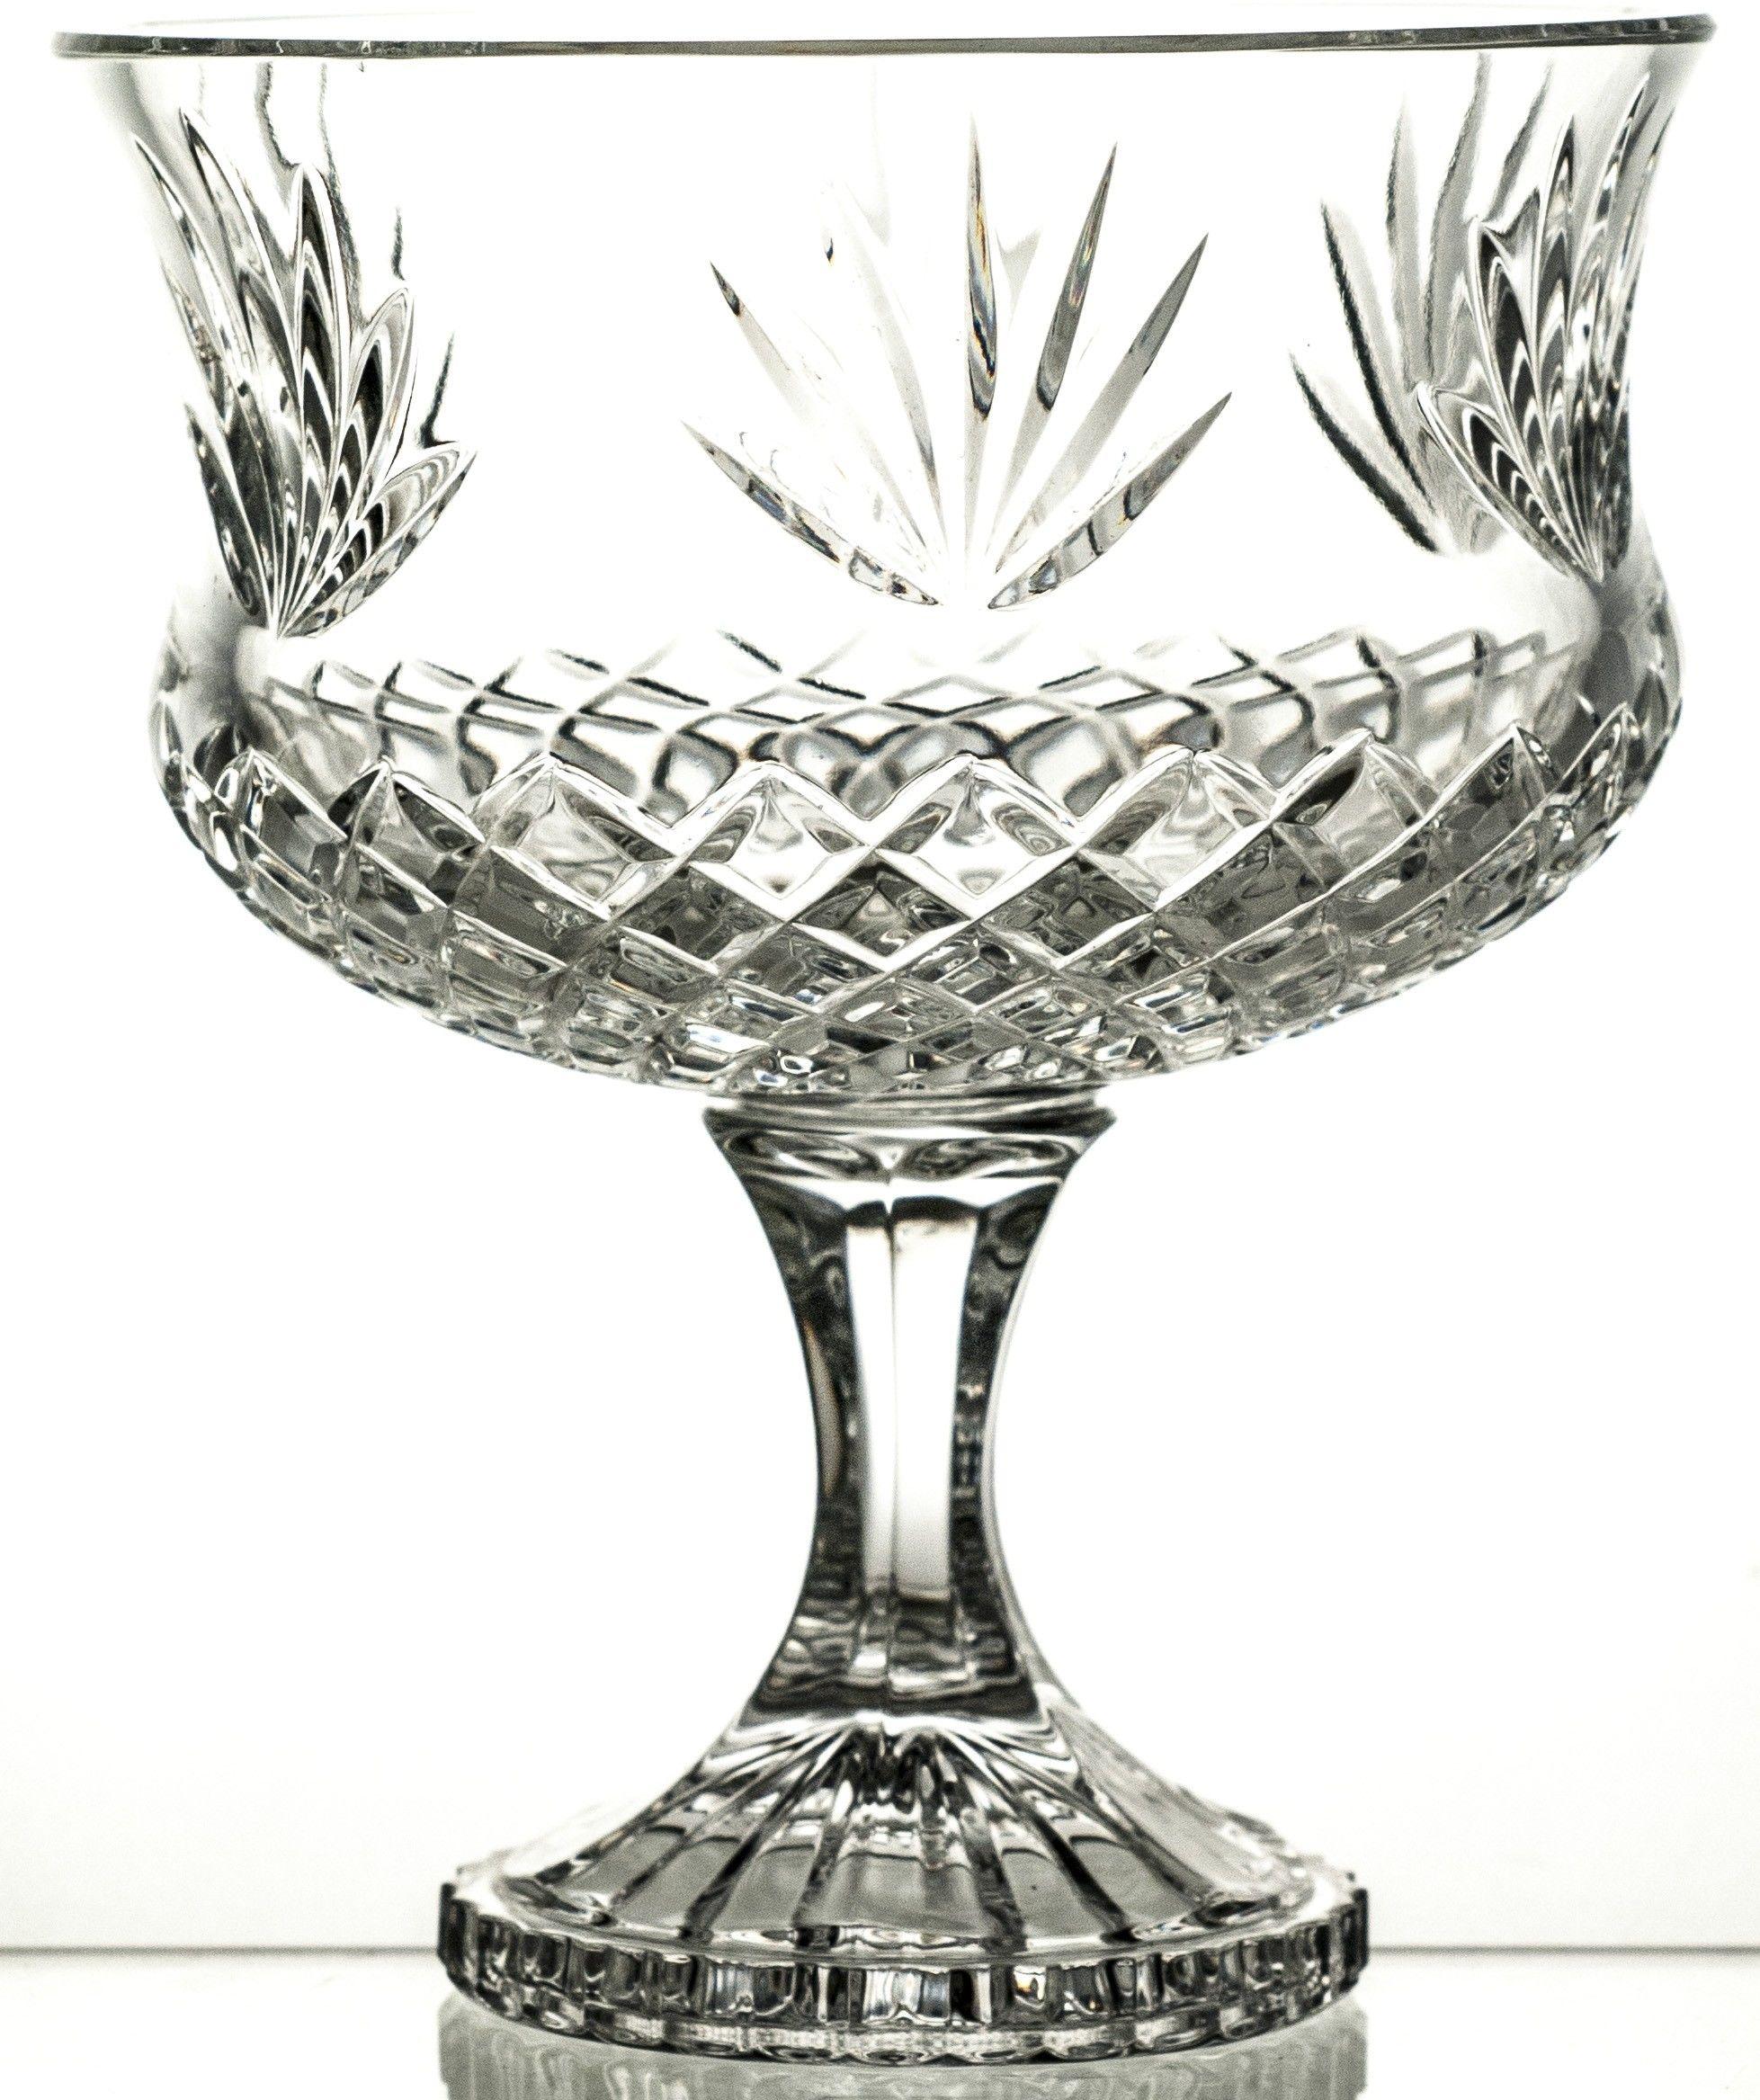 Owocarka kryształowa (02397)